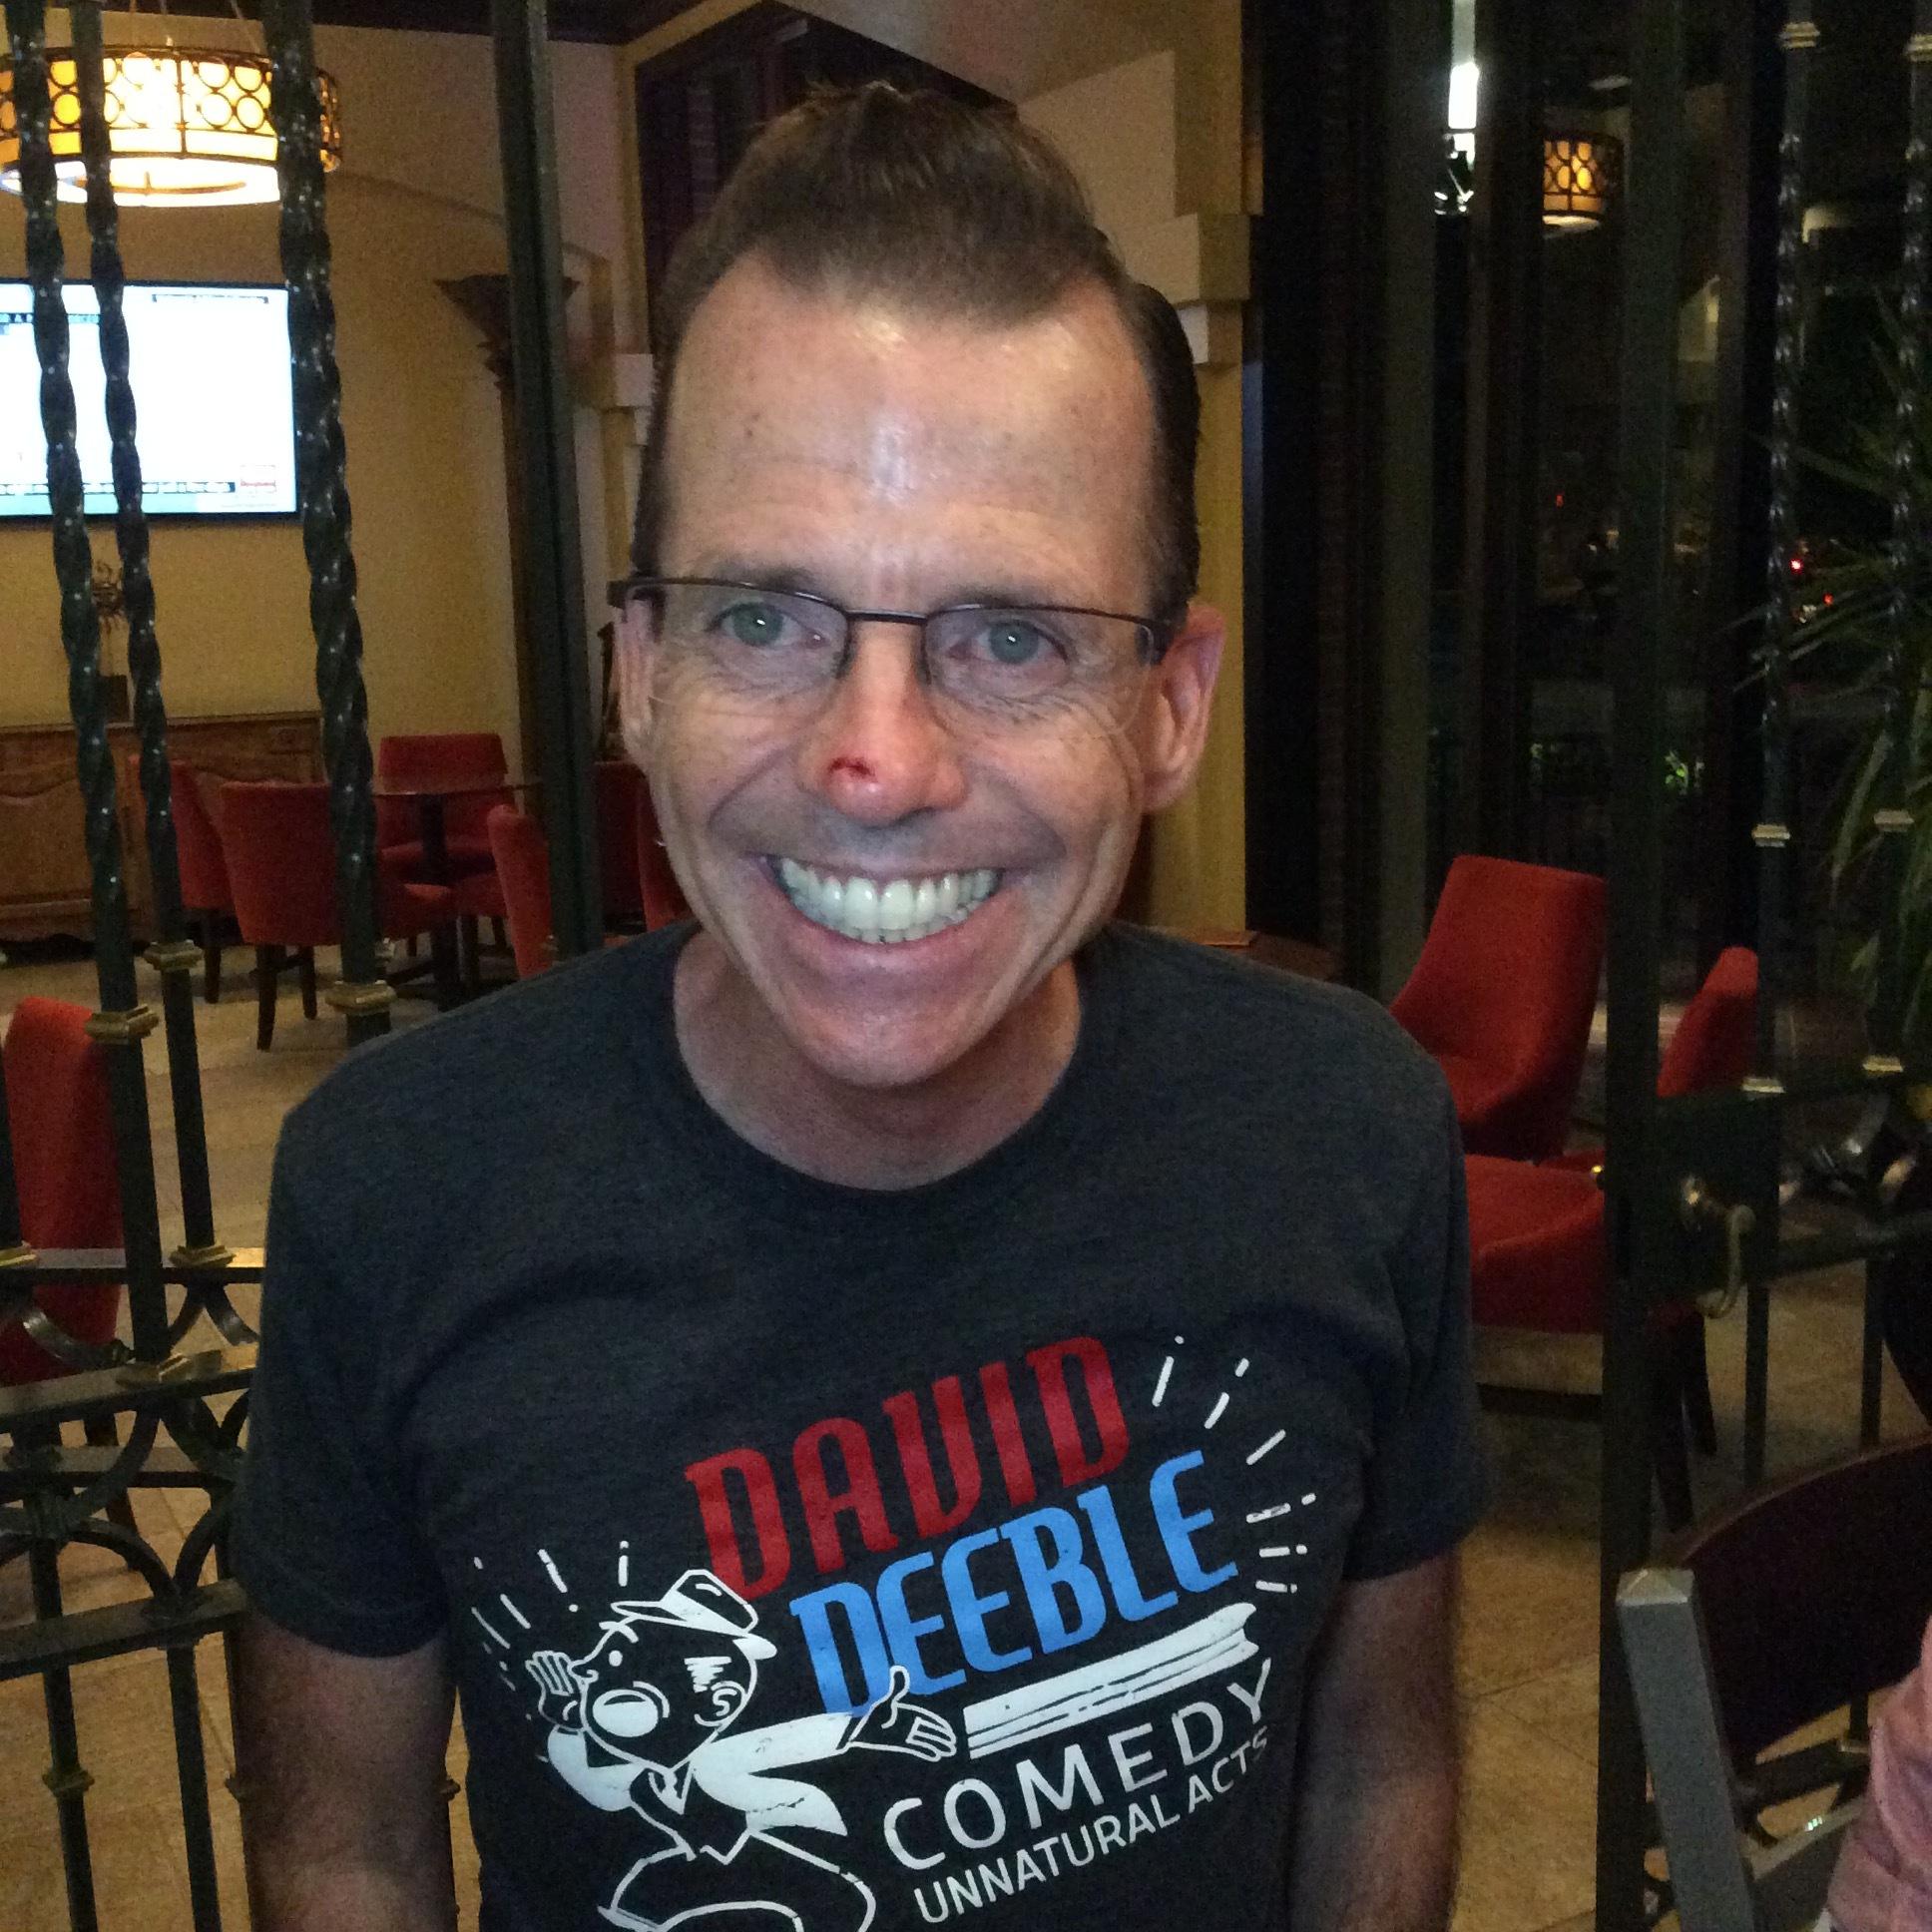 David Deeble